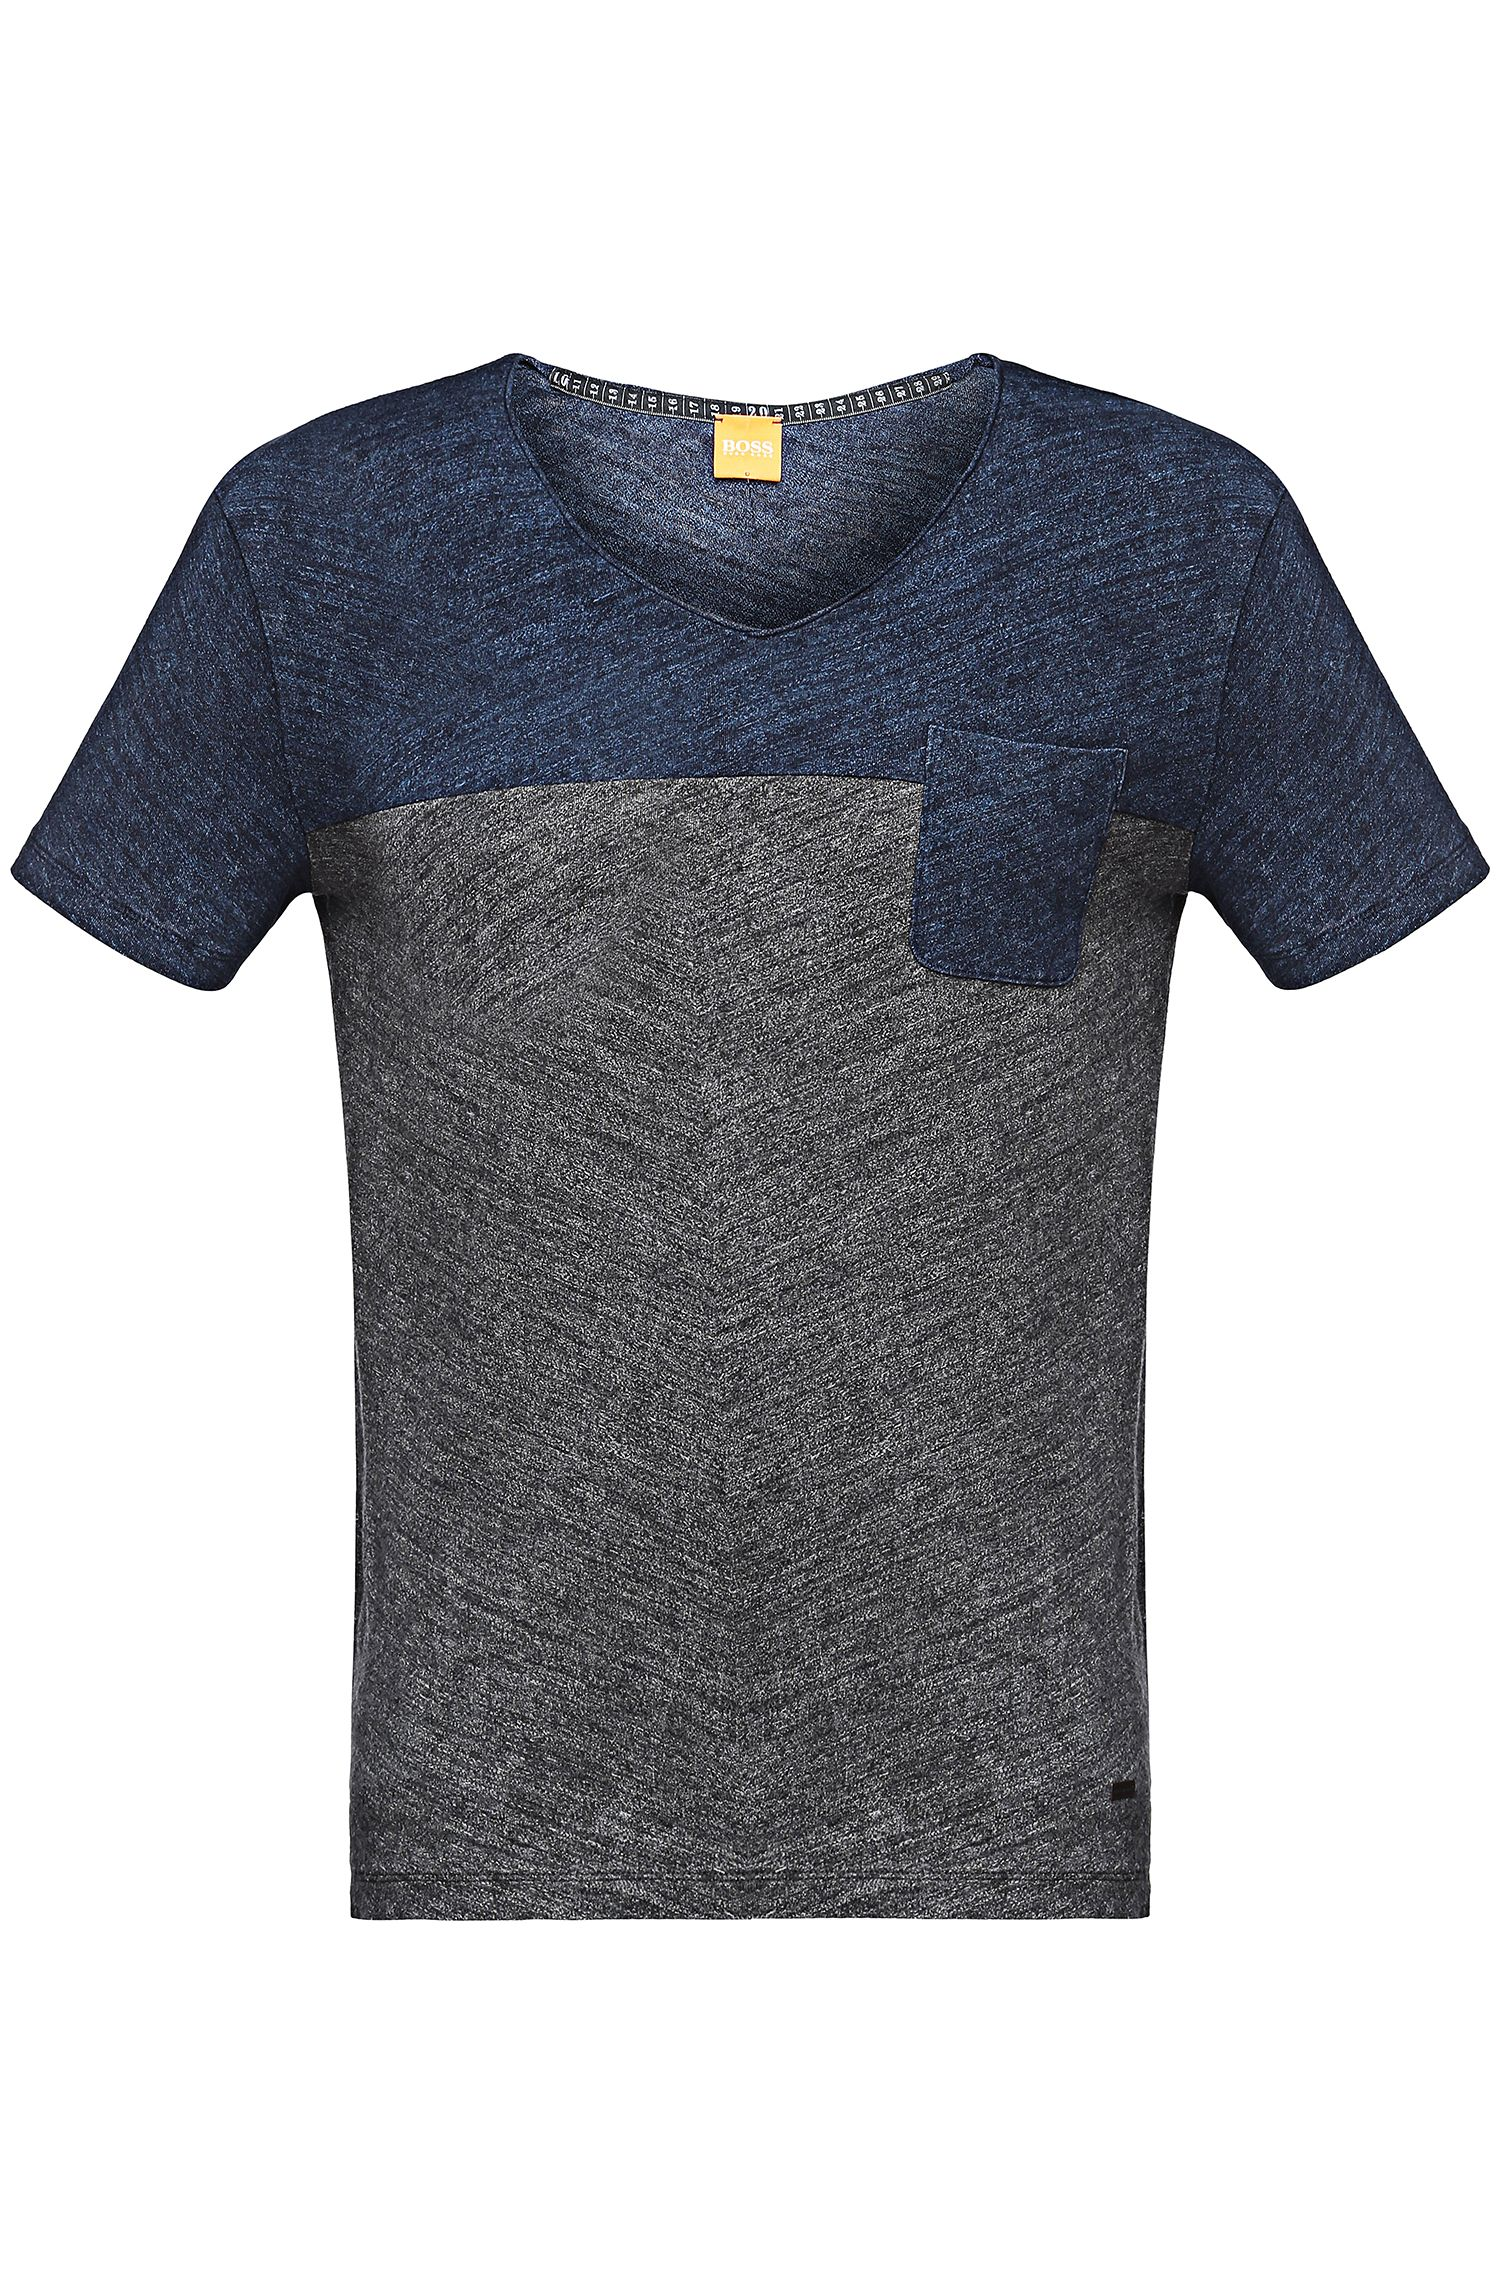 'Tedman' | Cotton Heather Colorblocked T-Shirt